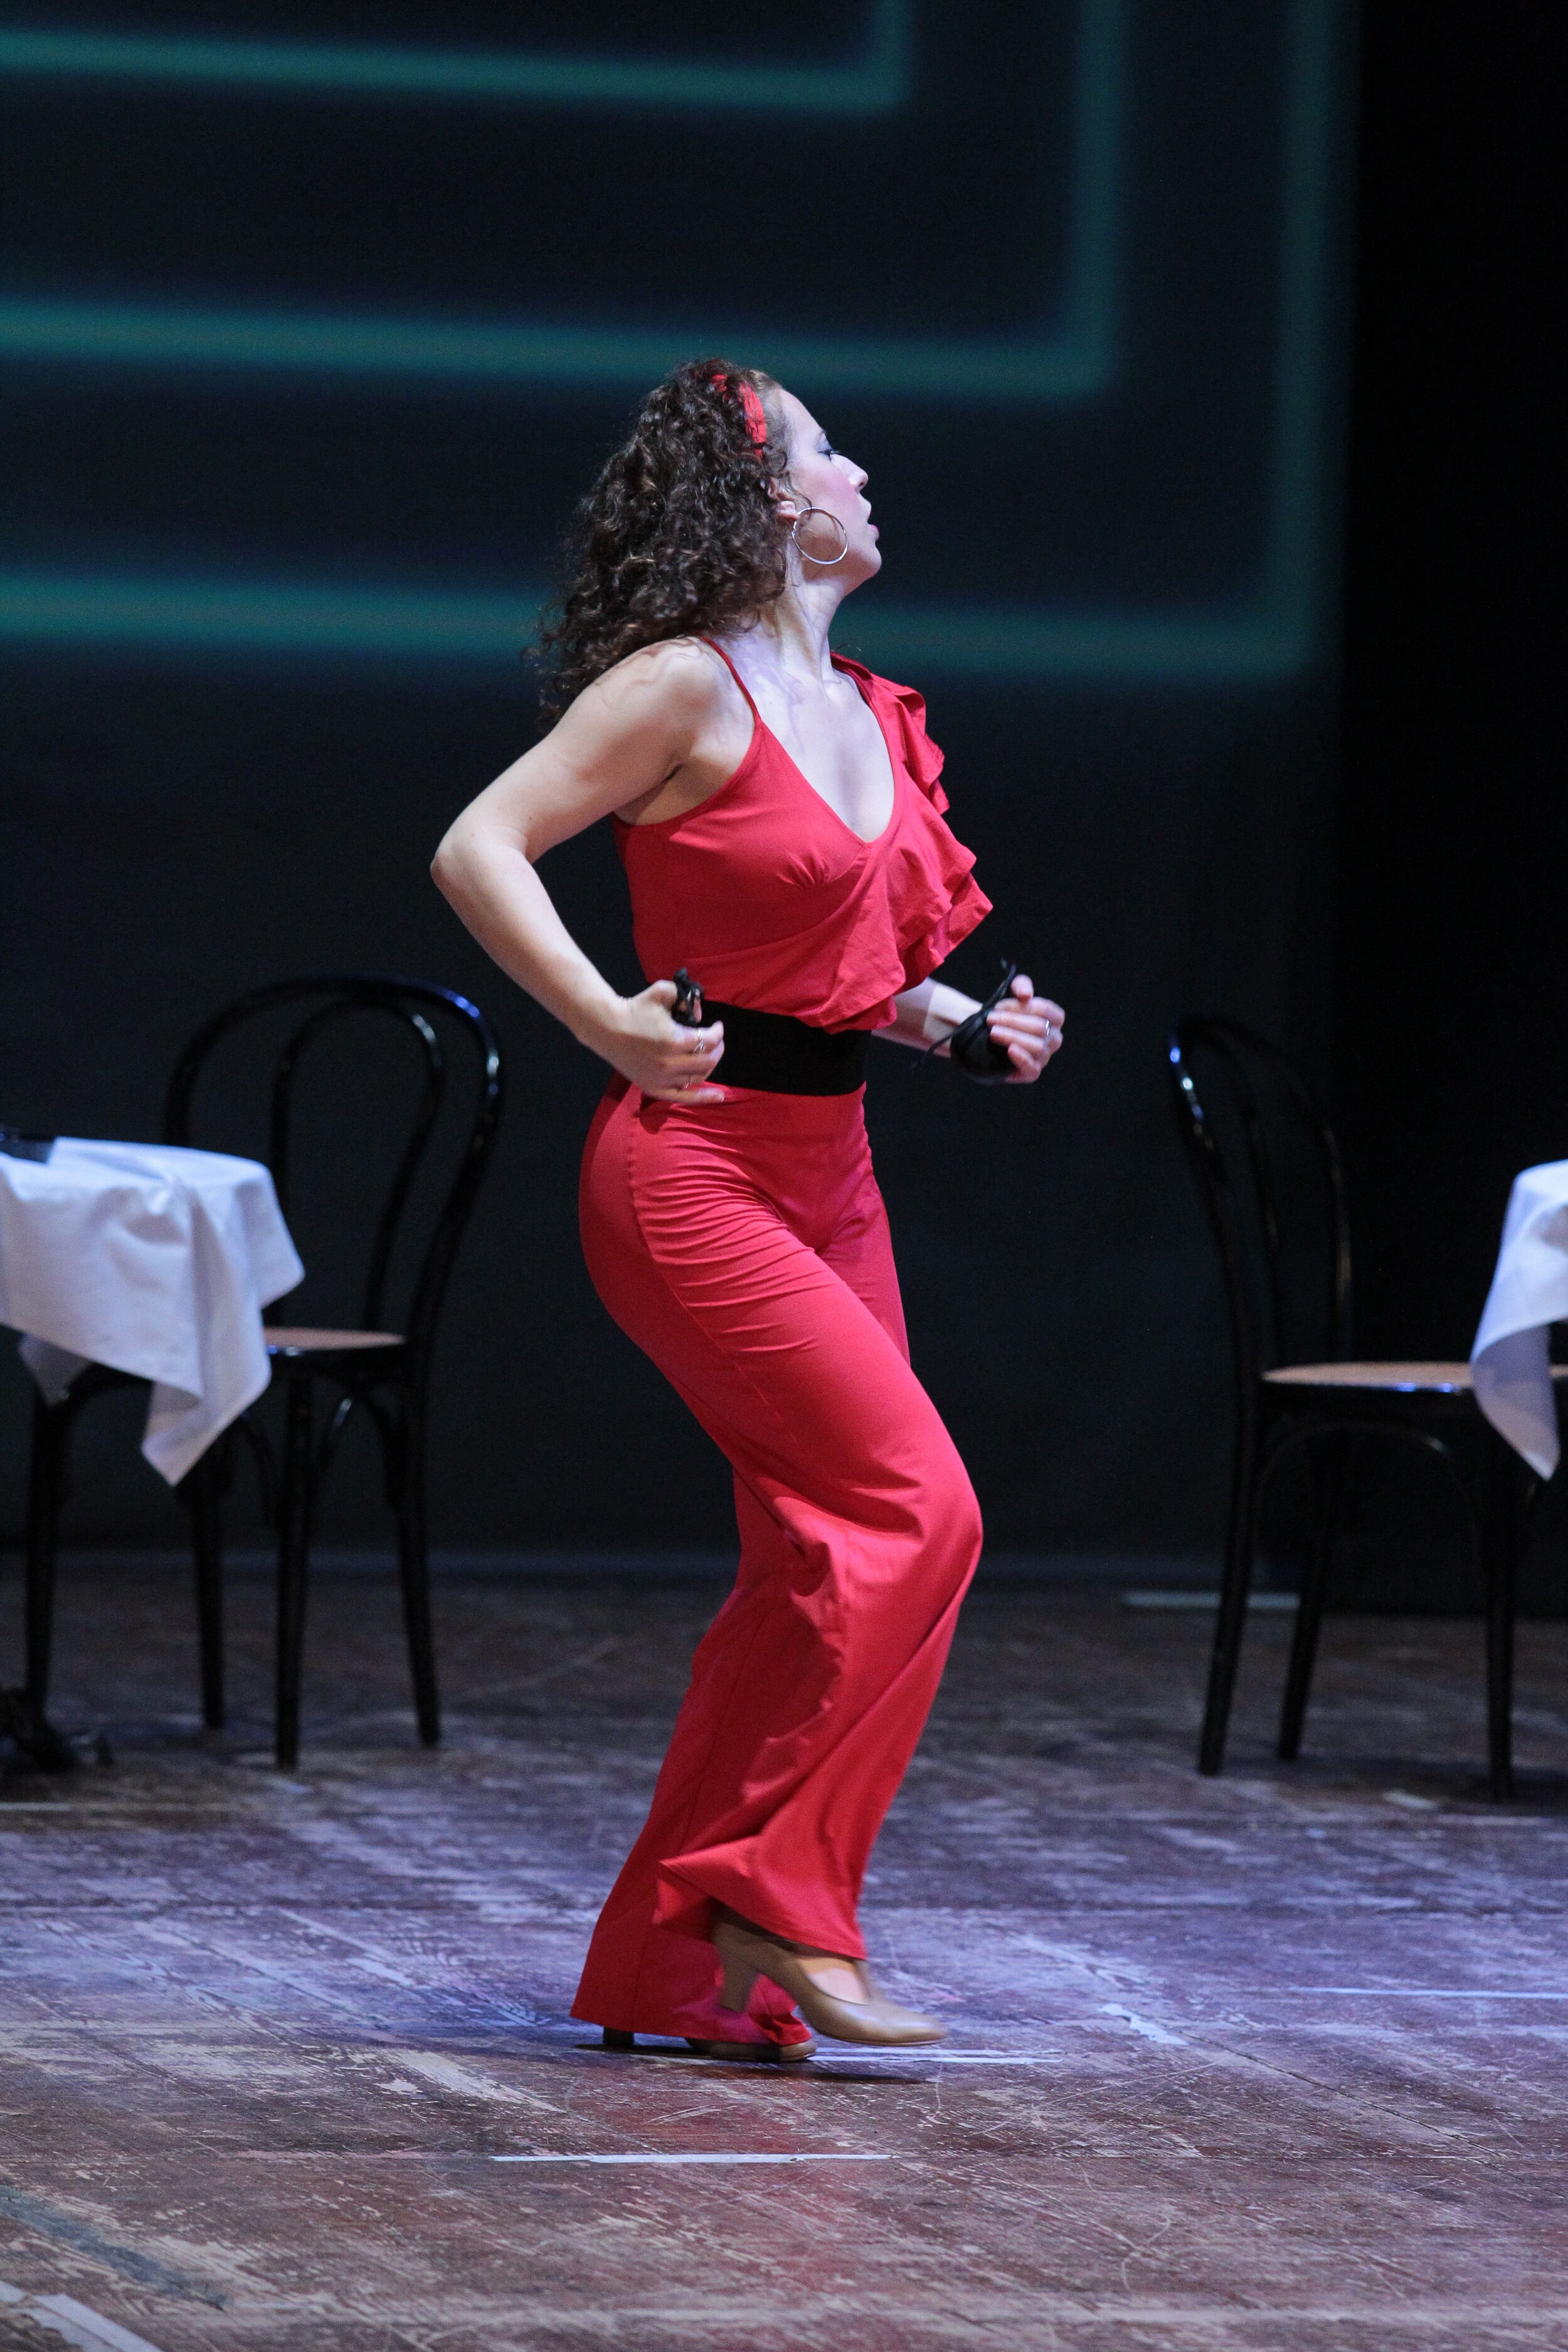 Carmen plays castanets